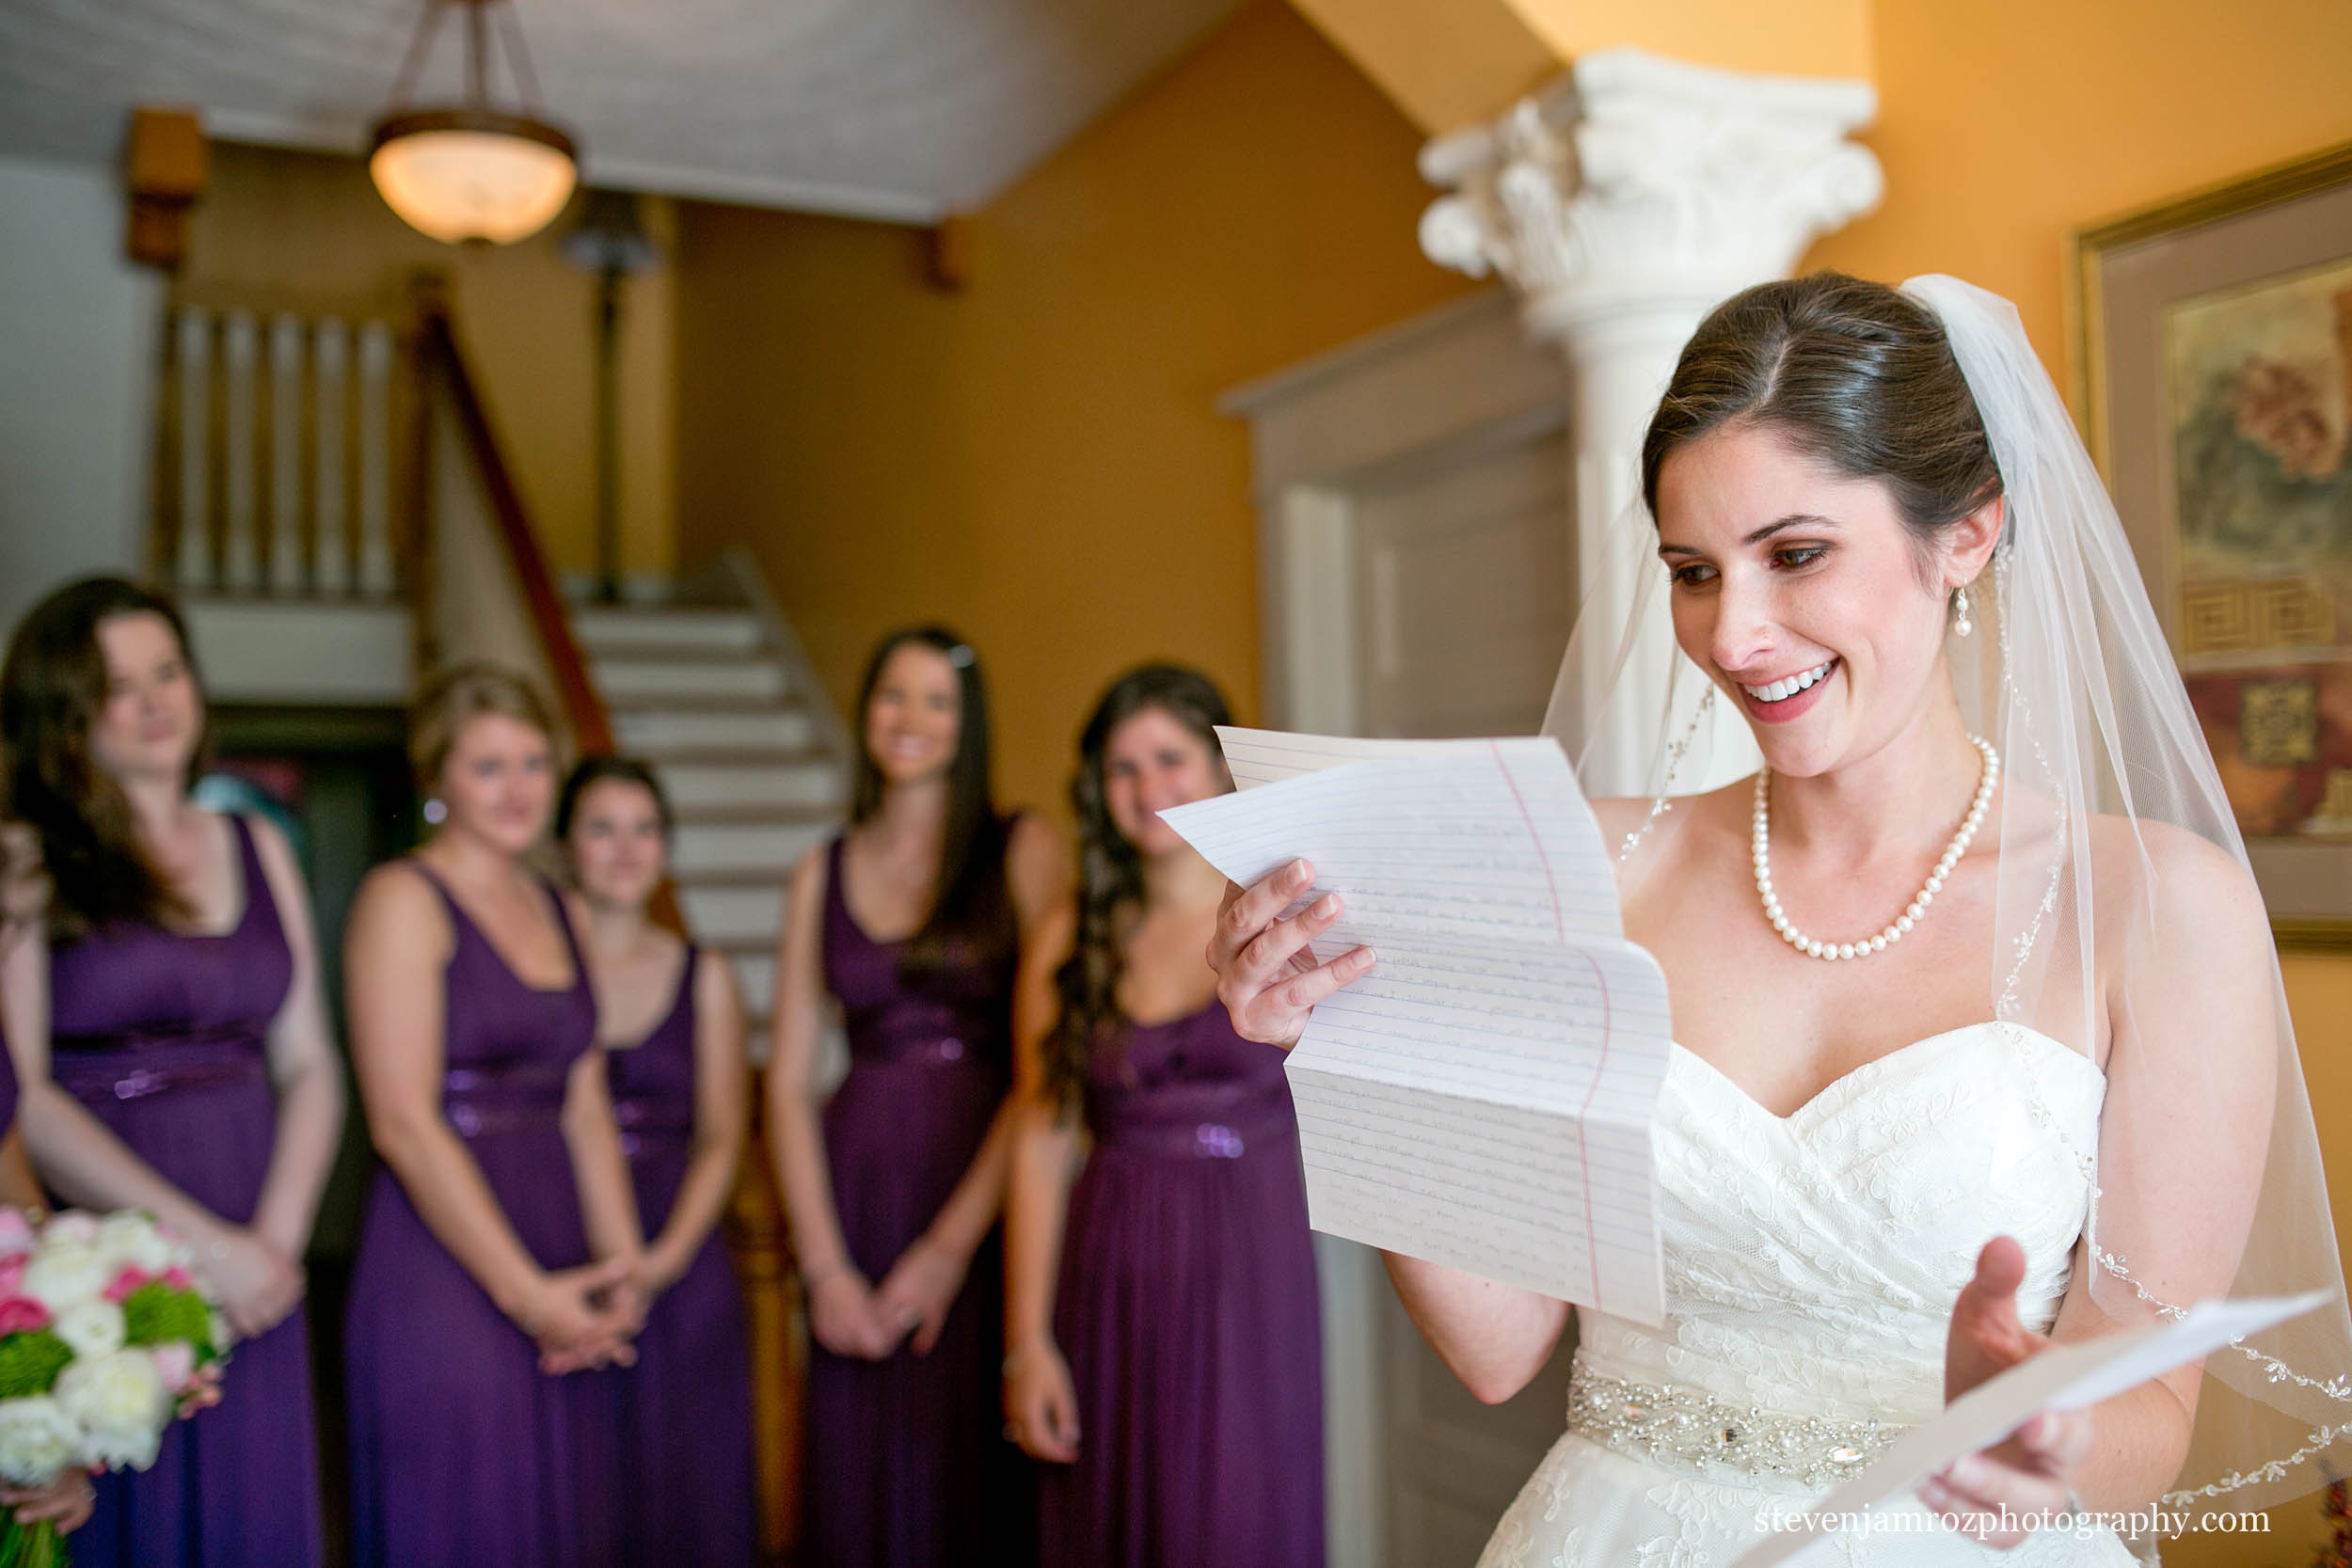 letter-to-bride-hudson-manor-steven-jamroz-photography-0328.jpg